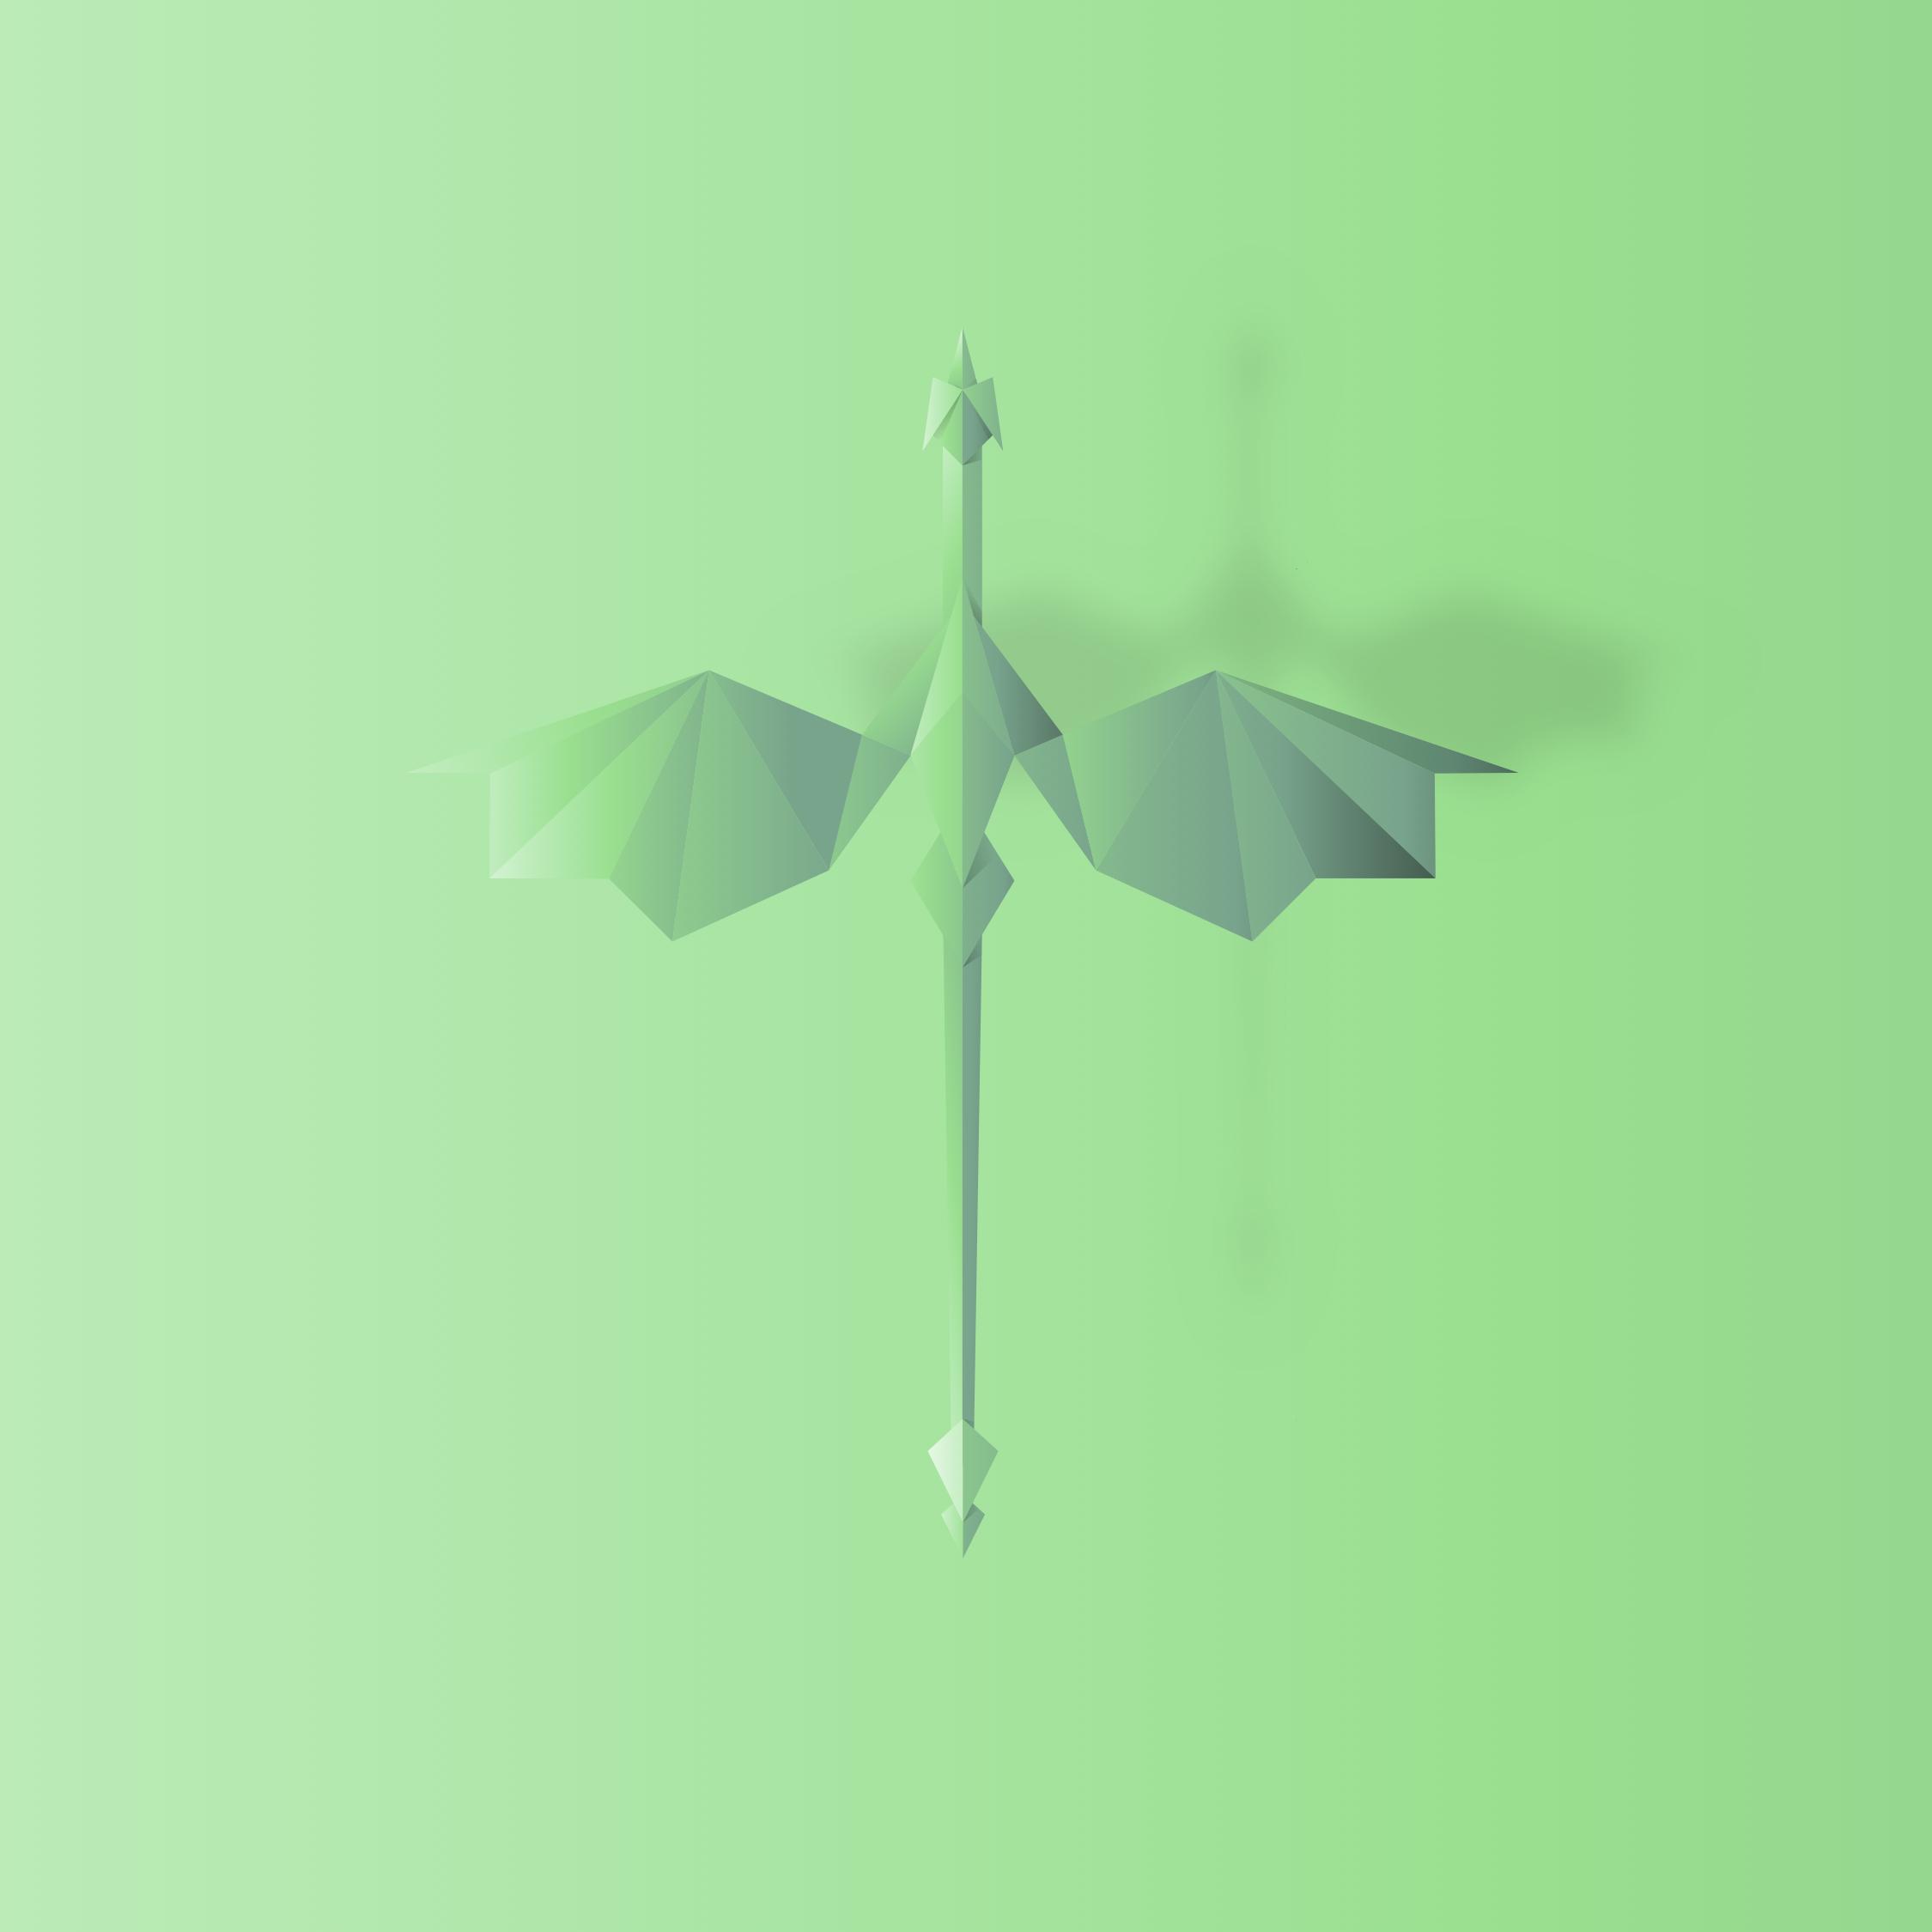 polydragon.jpg